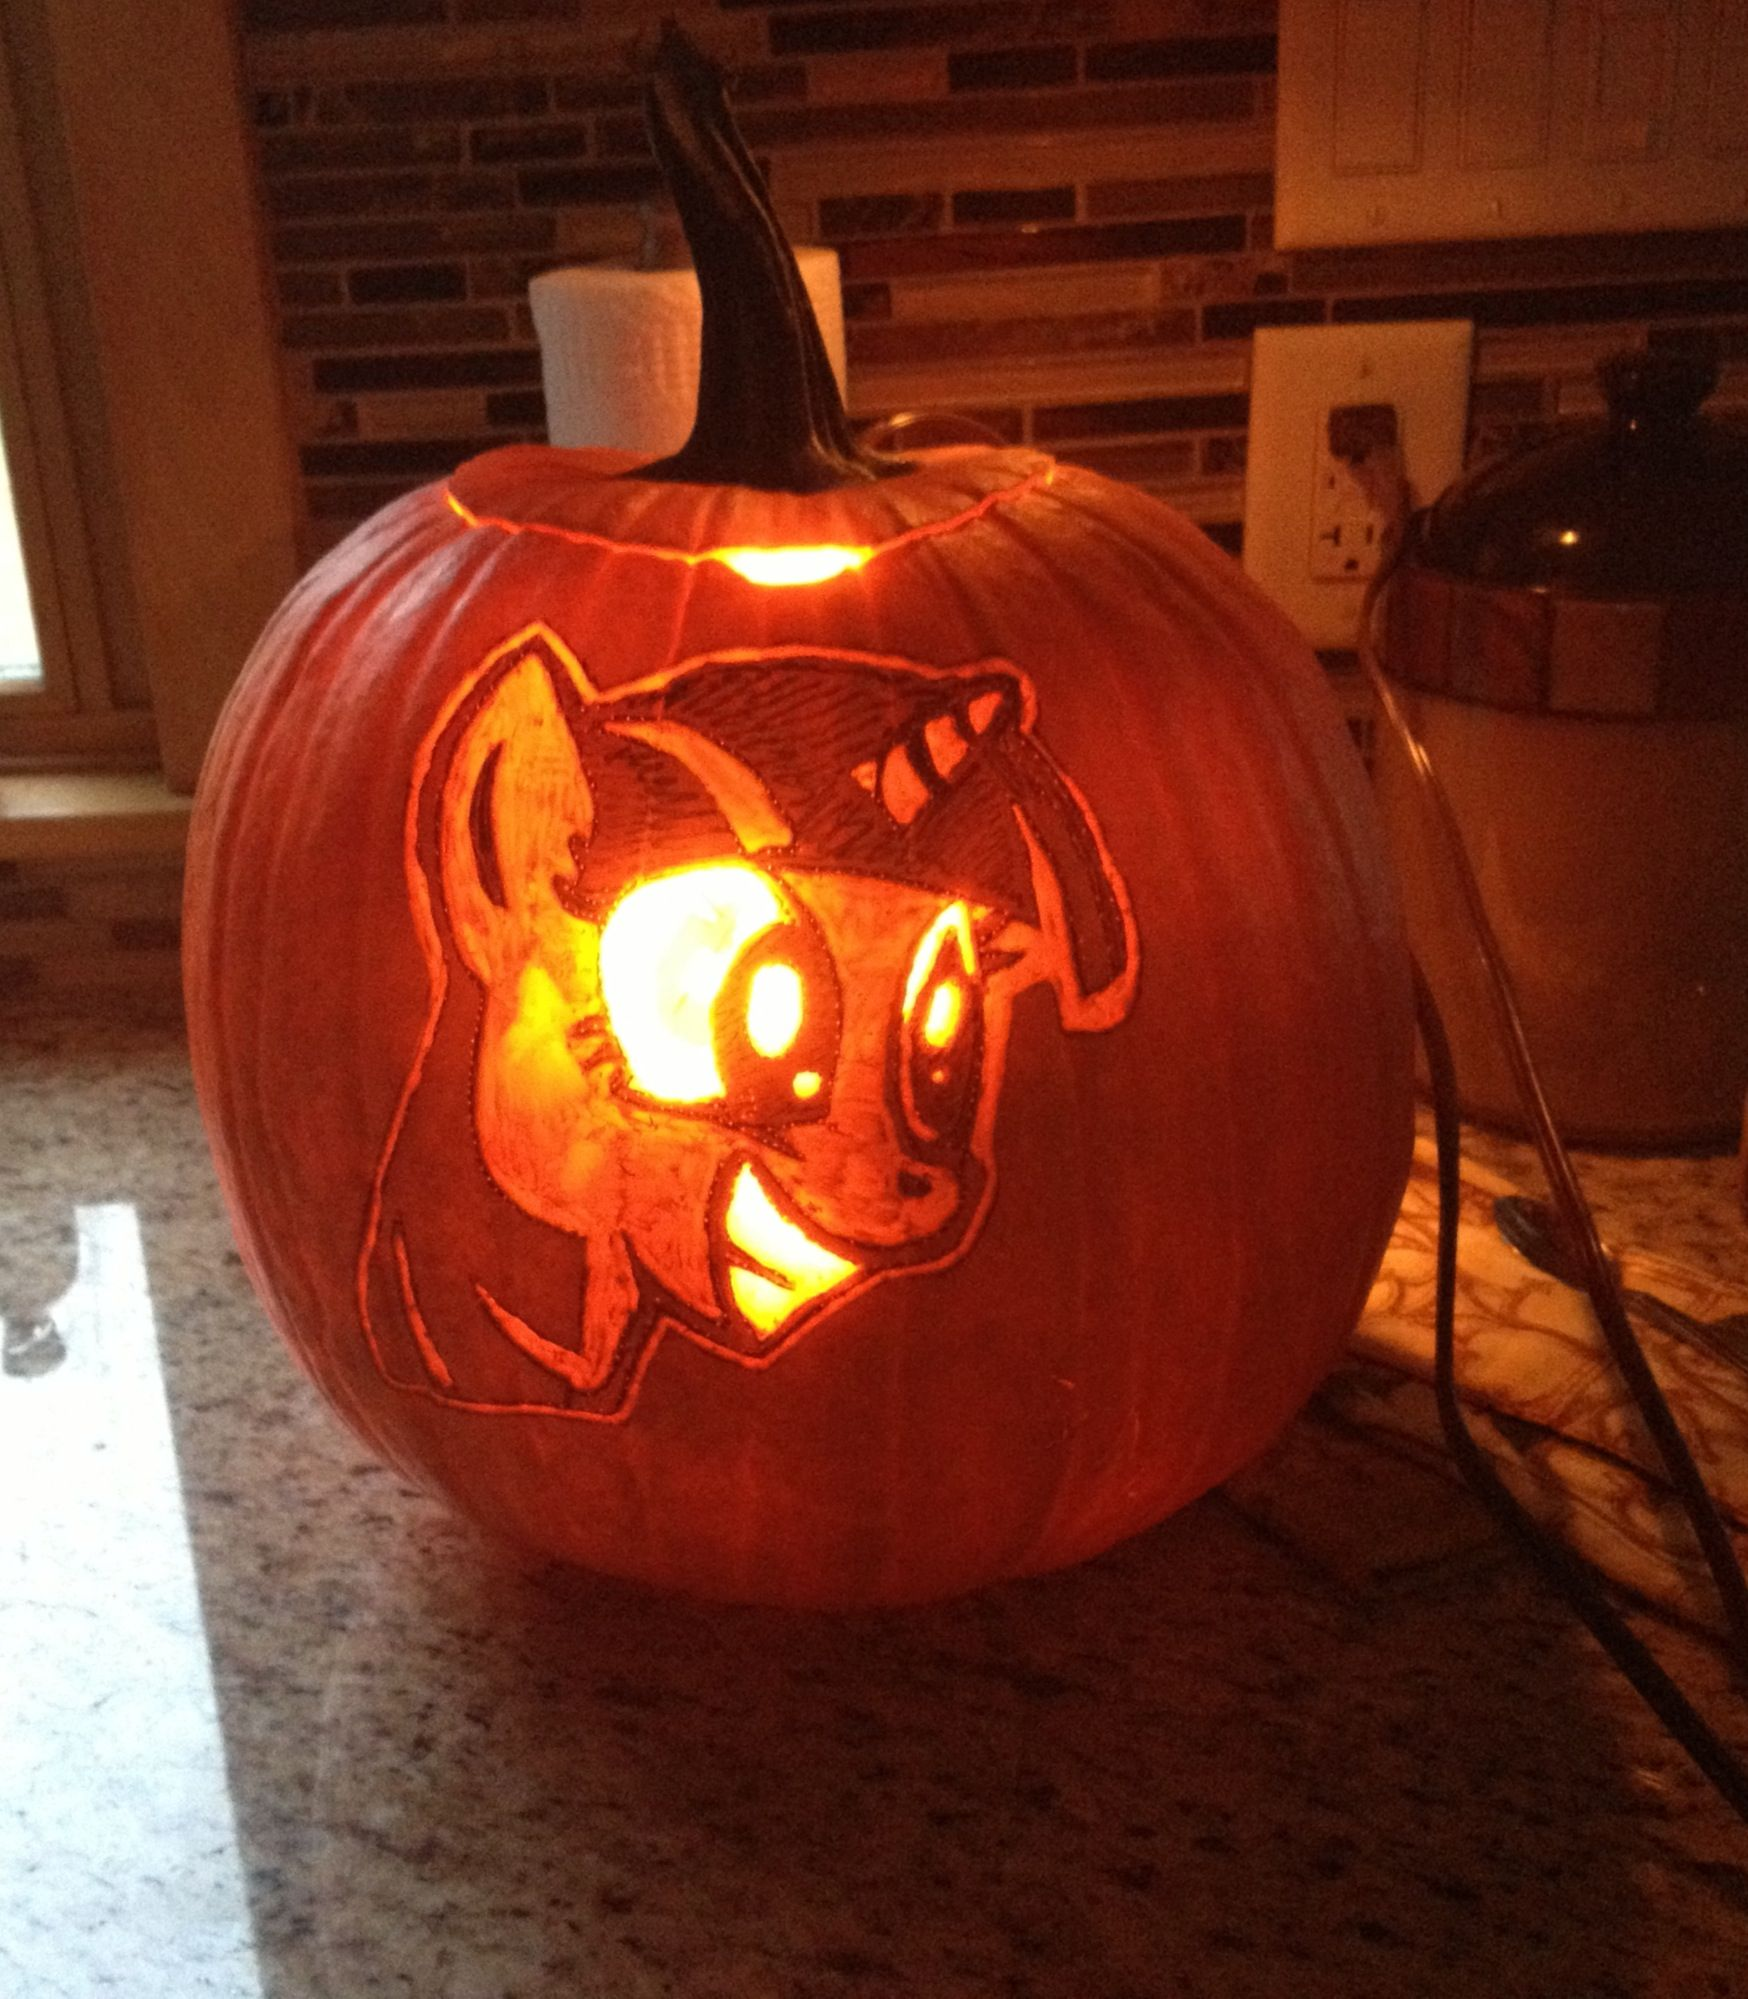 Twilight Sparkle pumpkin carving | My Little Pony | Pinterest ...